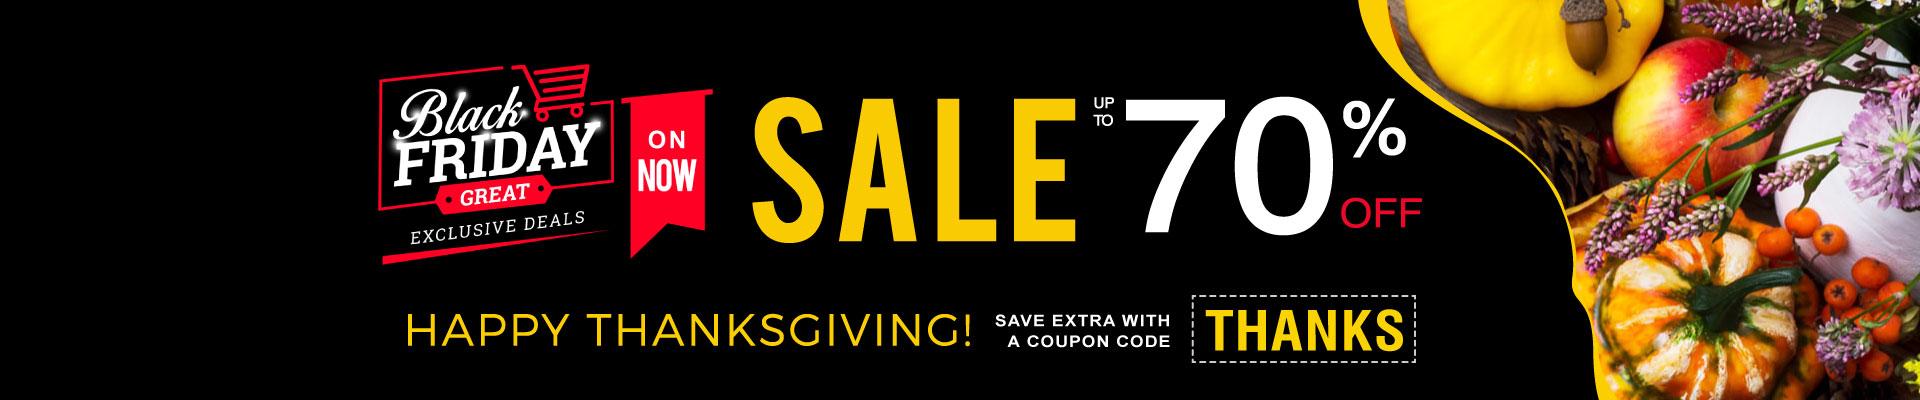 ePuffer Black Friday Sale